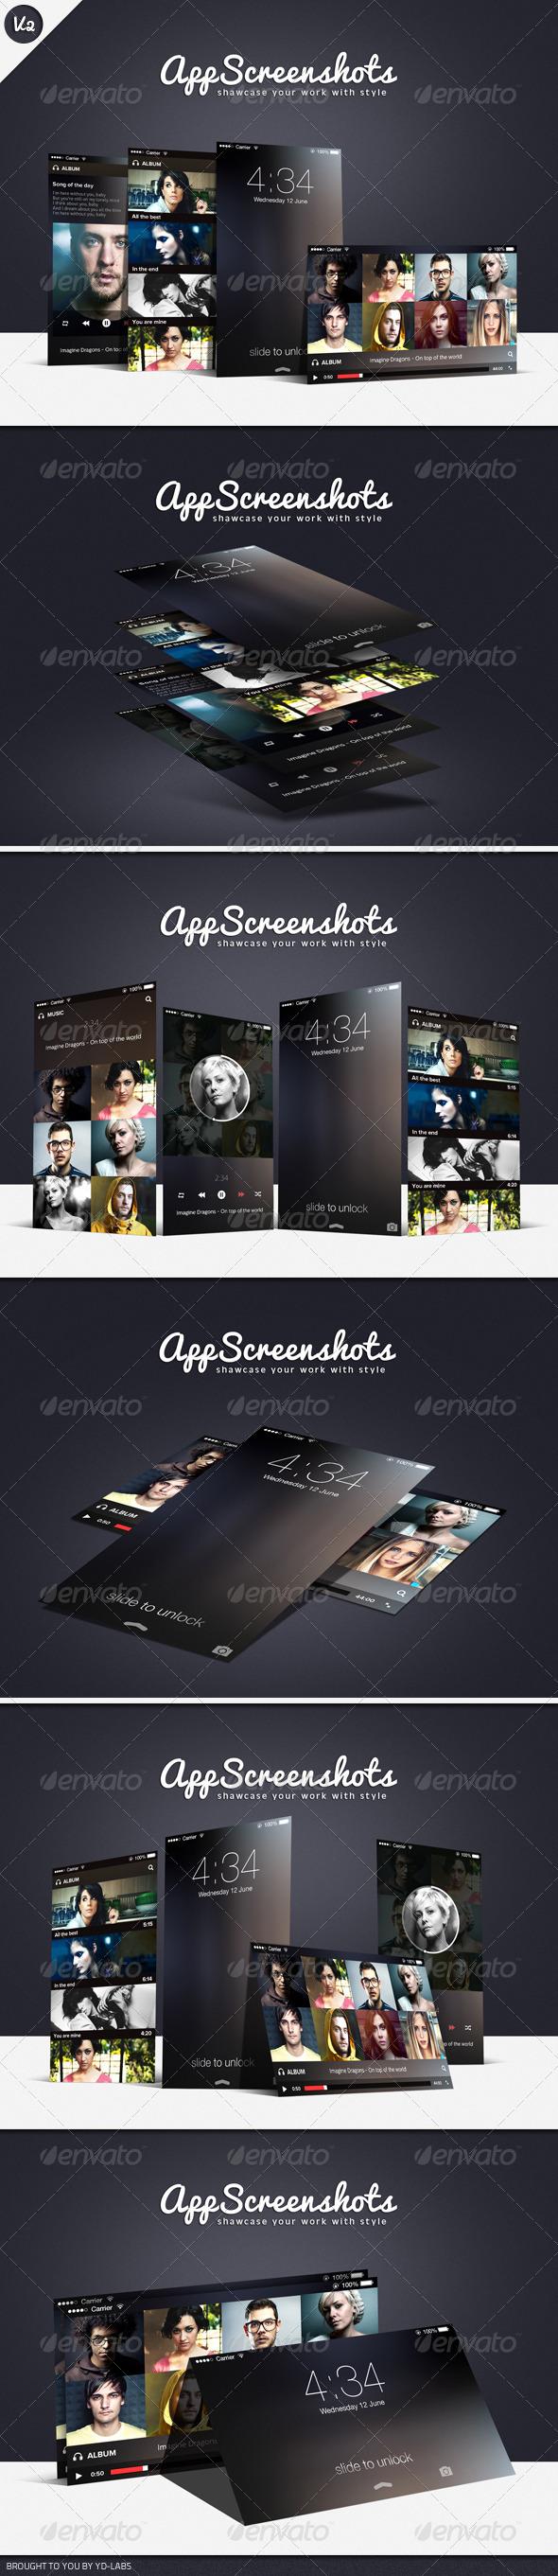 GraphicRiver App Screenshot Mockups V2 5604136